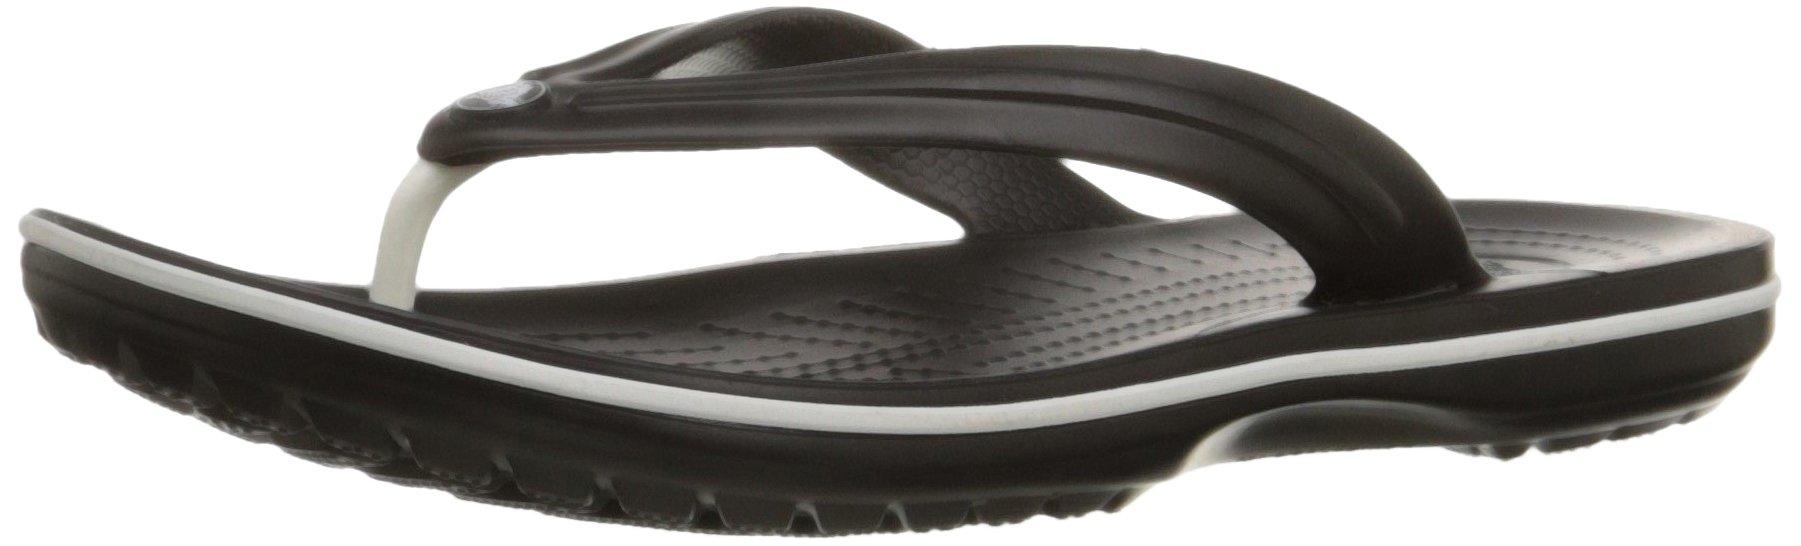 Crocs Crocband Flip Flop, Black, Men's 7, Women's 9 Medium by Crocs